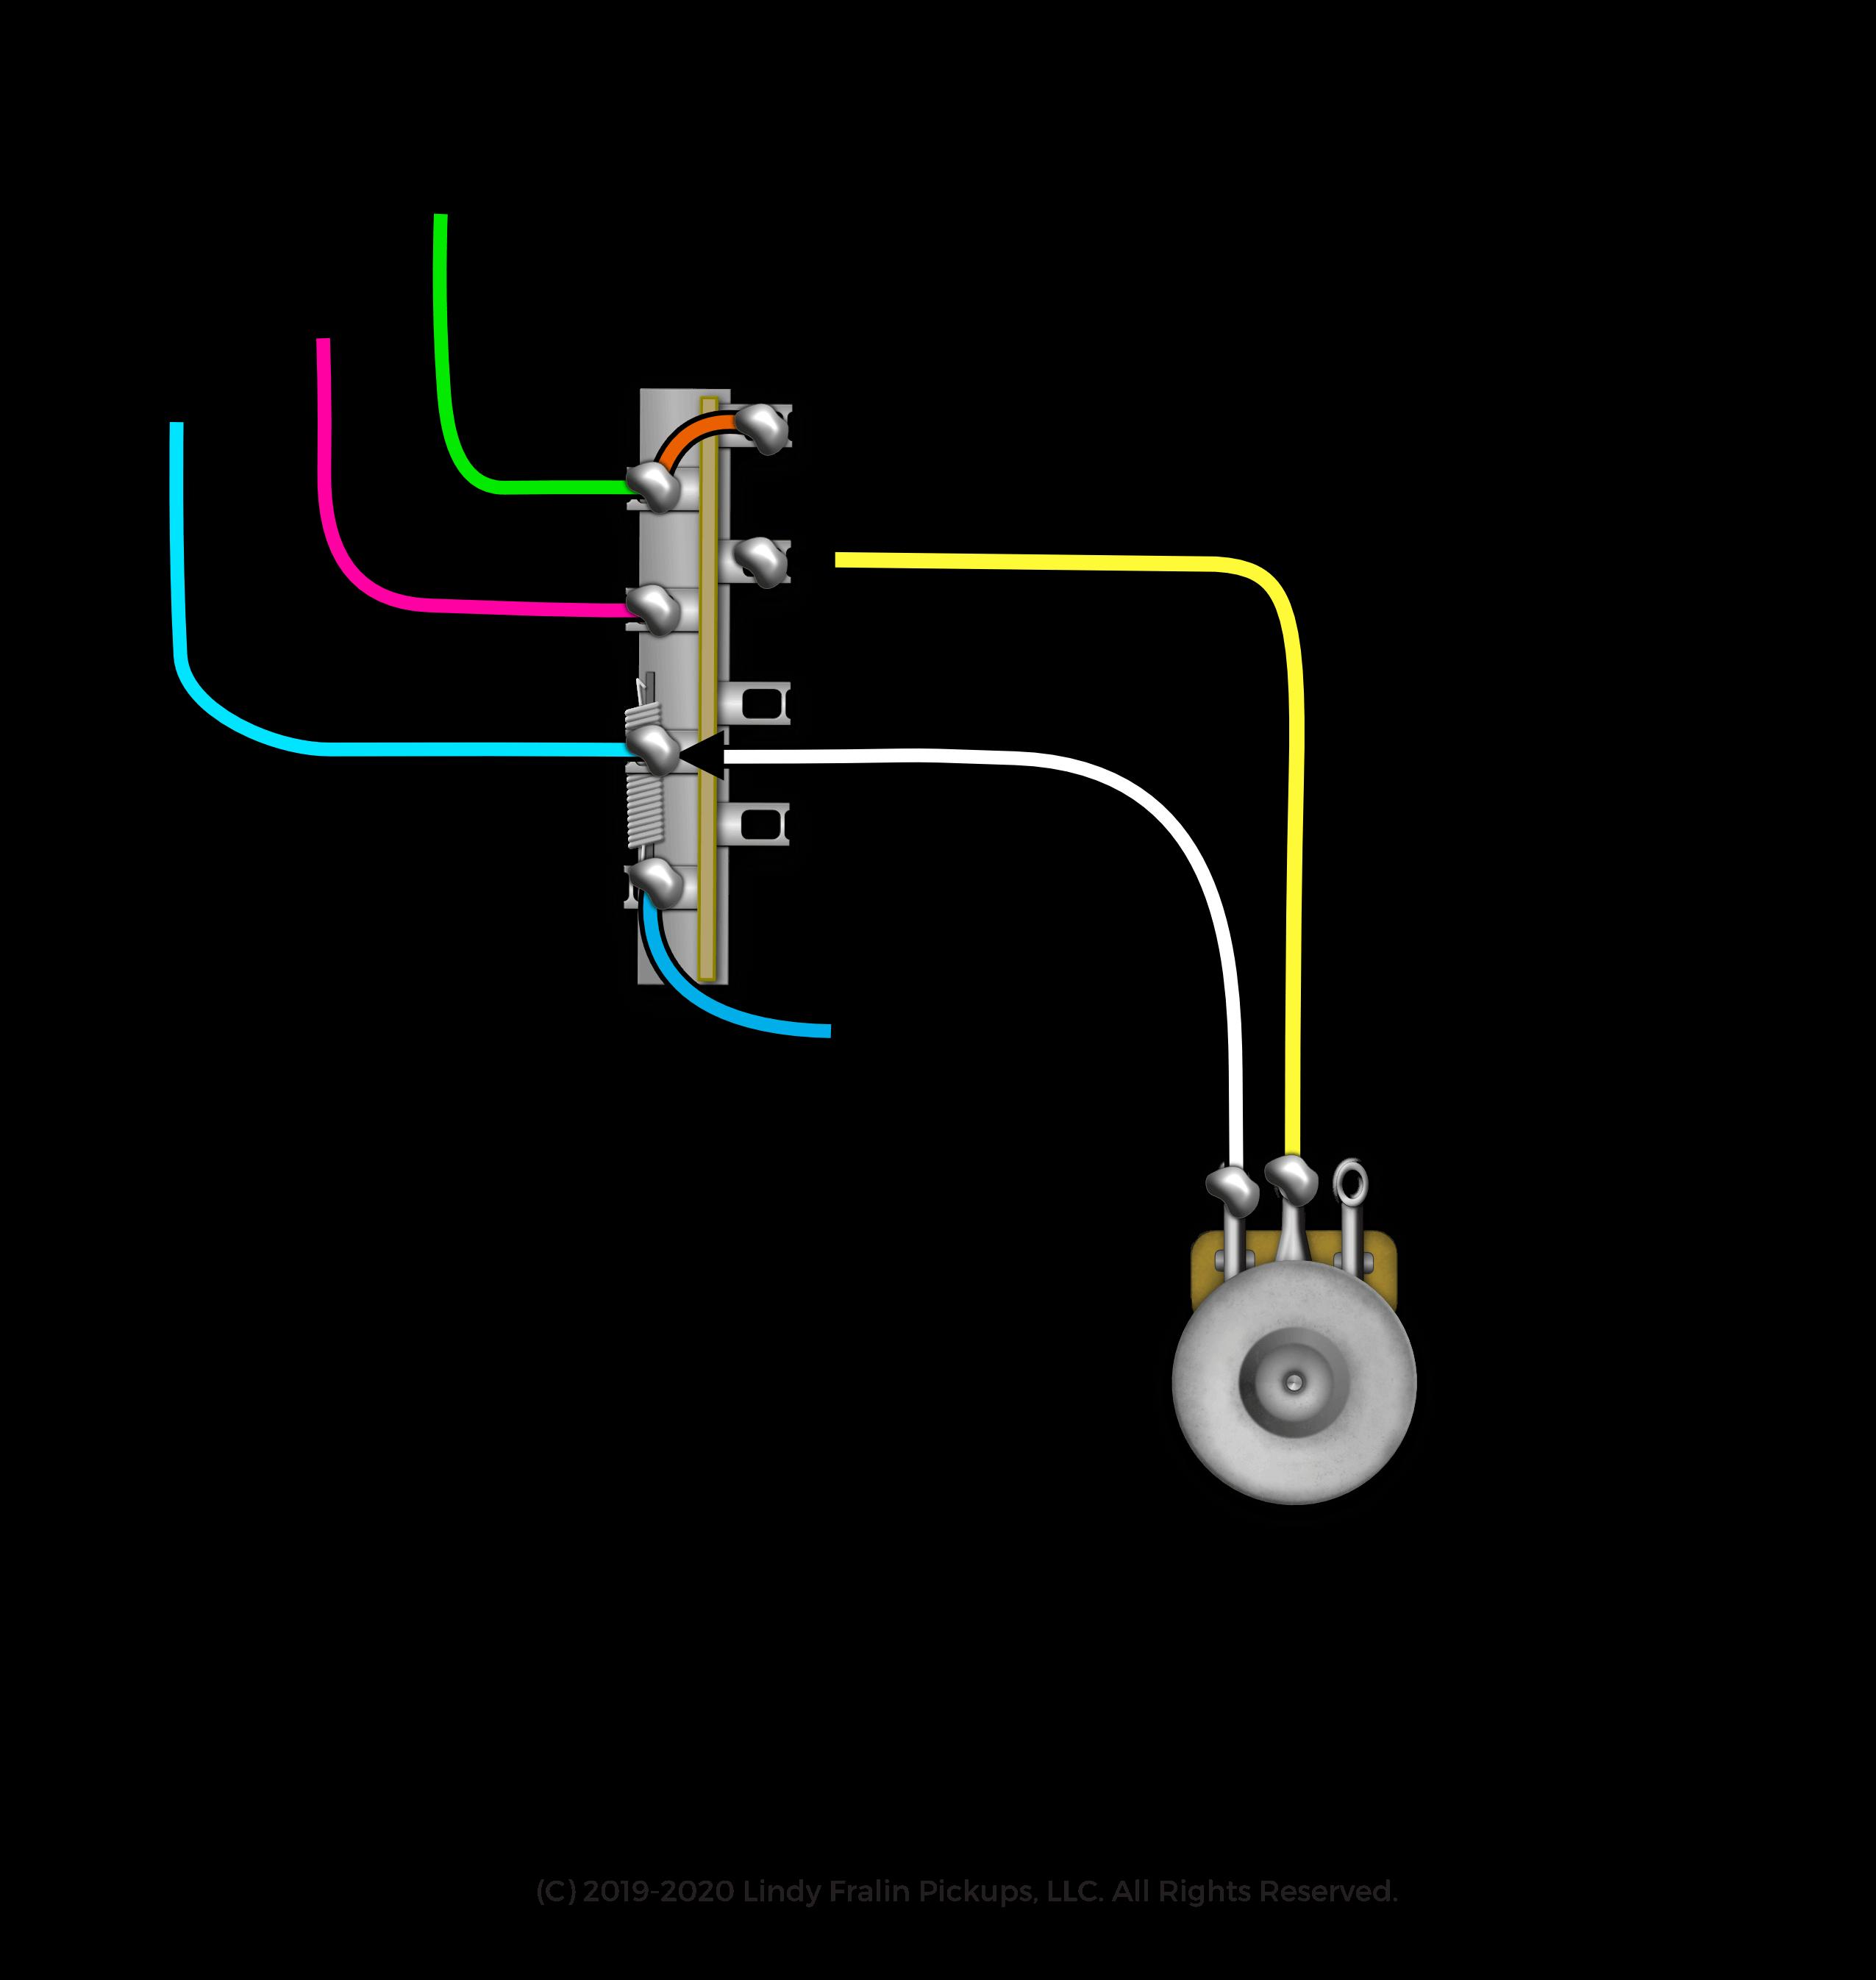 Half Blender Wiring Diagram Fralin Pickups